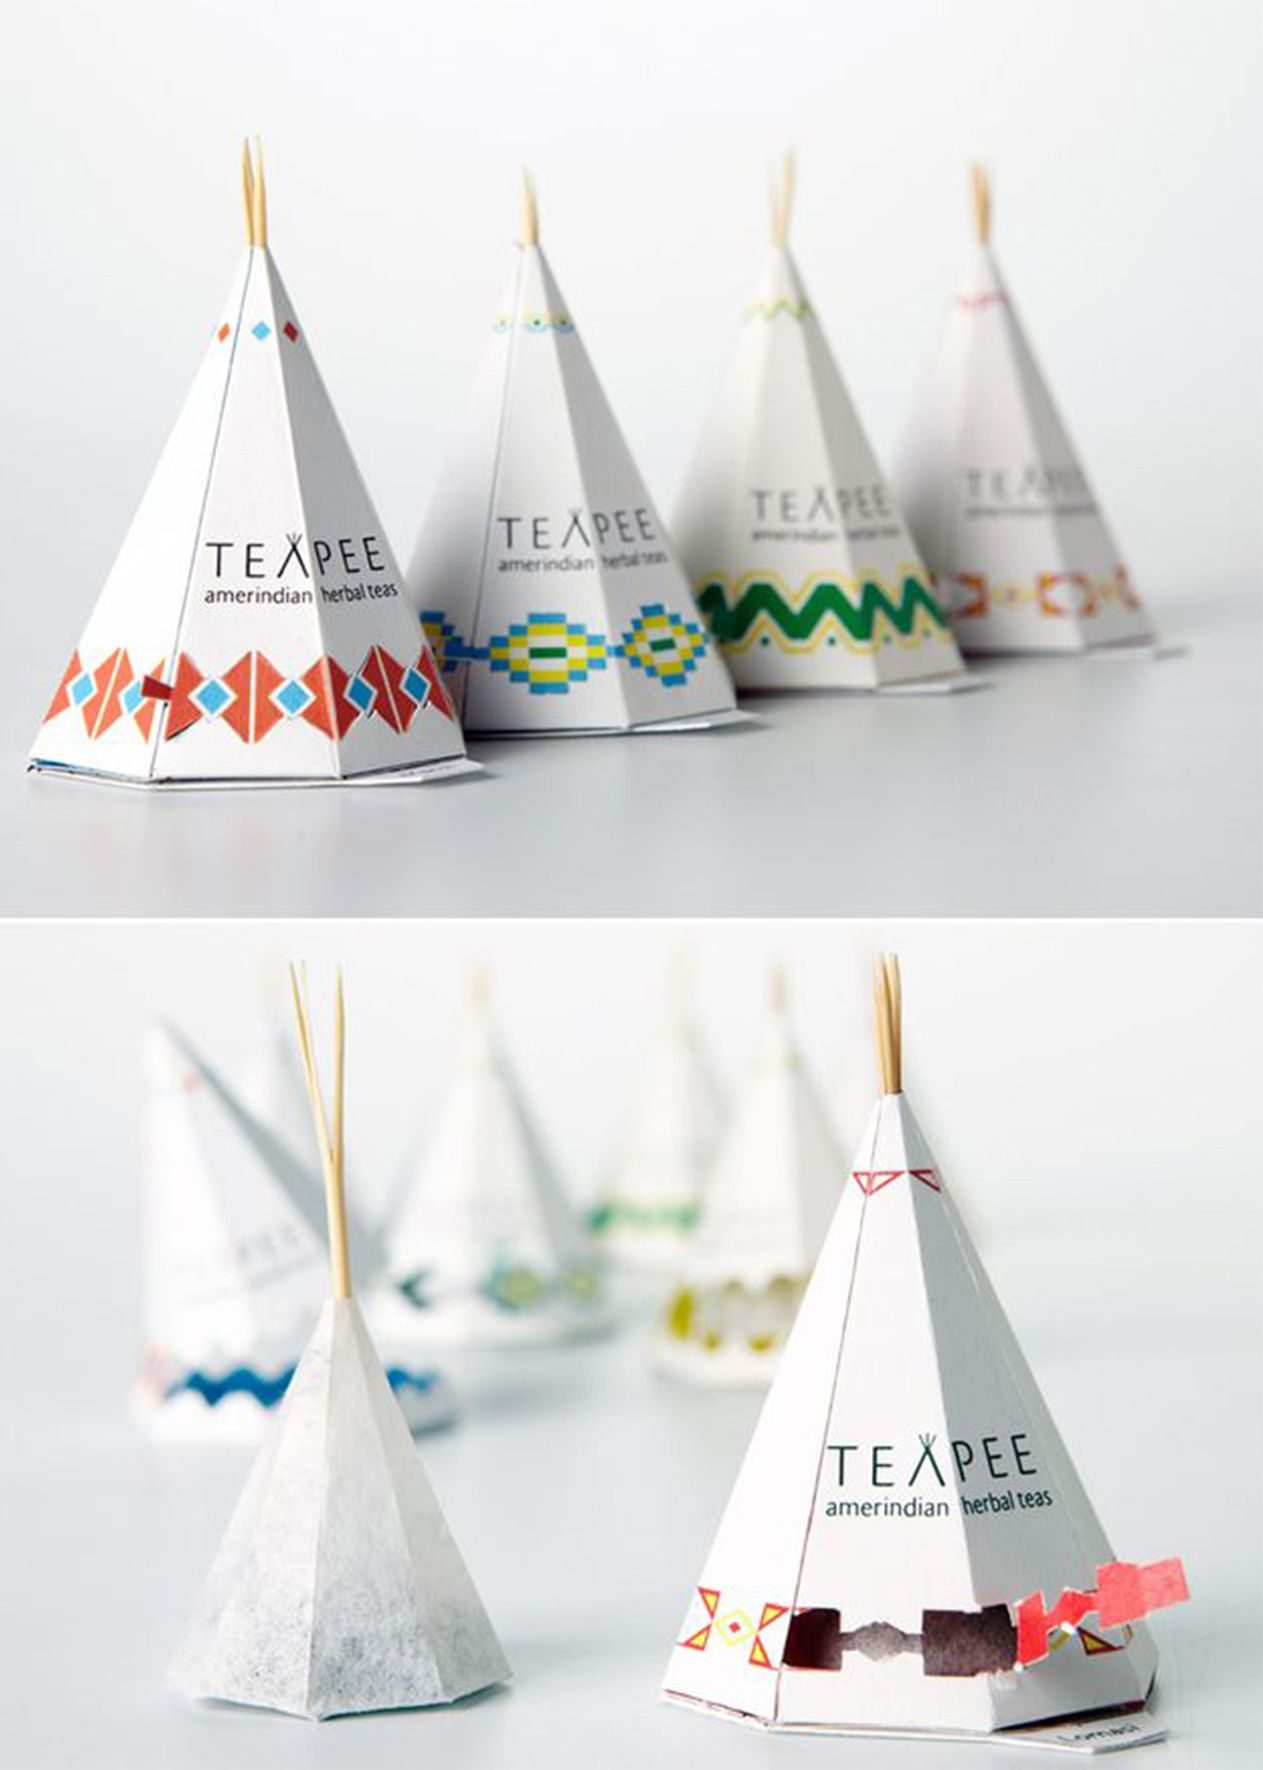 teapee-the.jpg 1263×1770 pixels